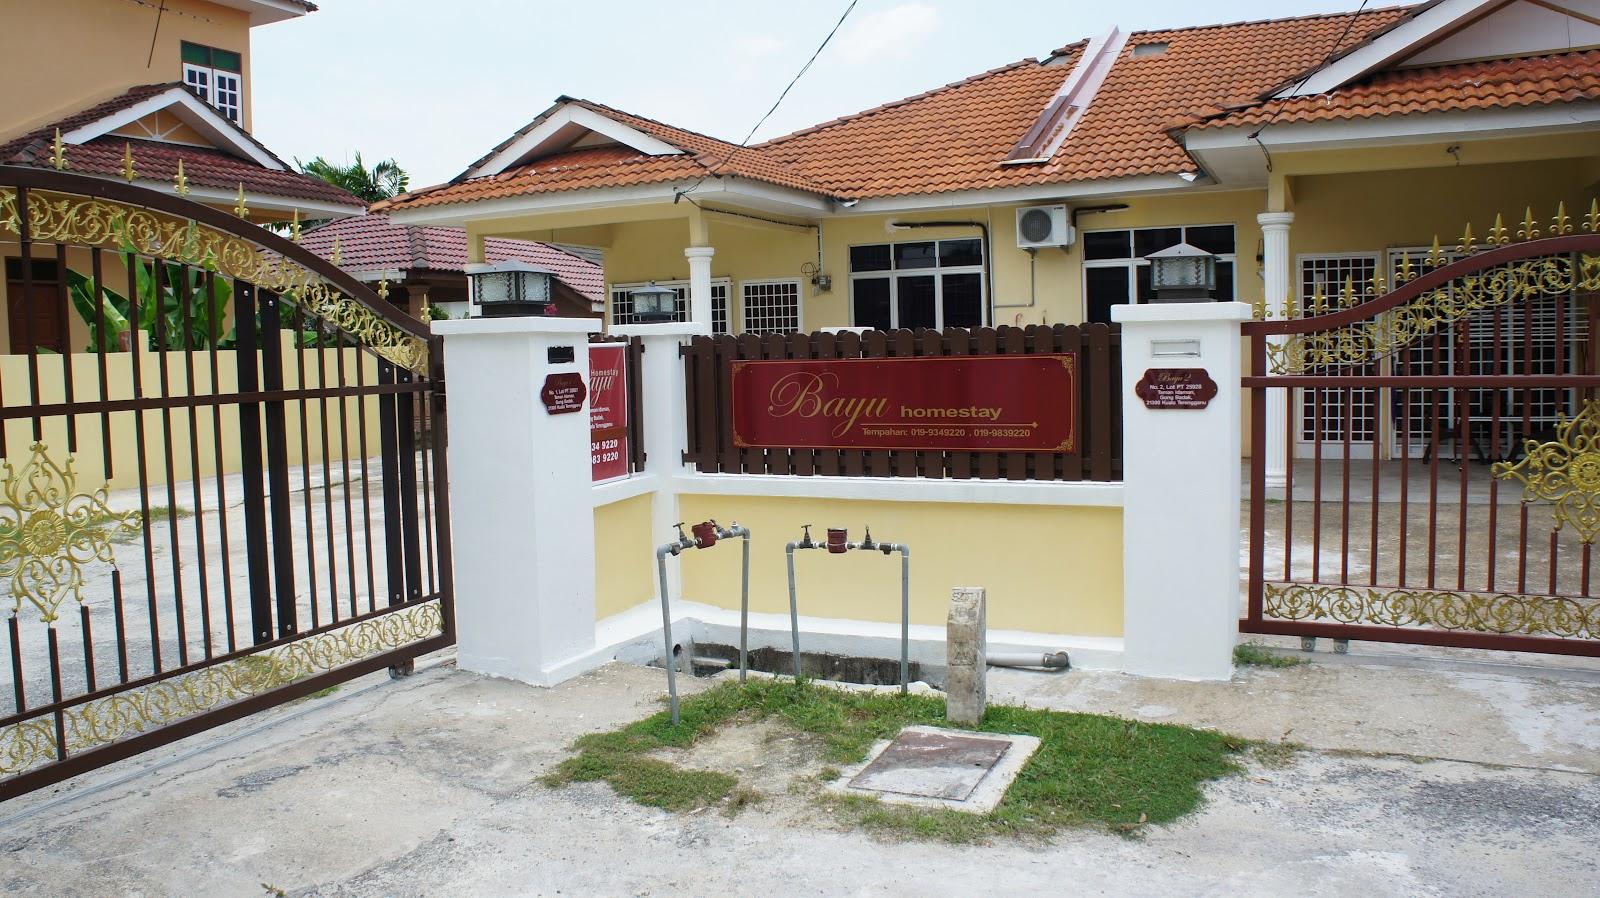 Permalink to 10 Homestay Terbaik Kuala Terengganu Wifi – Review Bayu Homestay